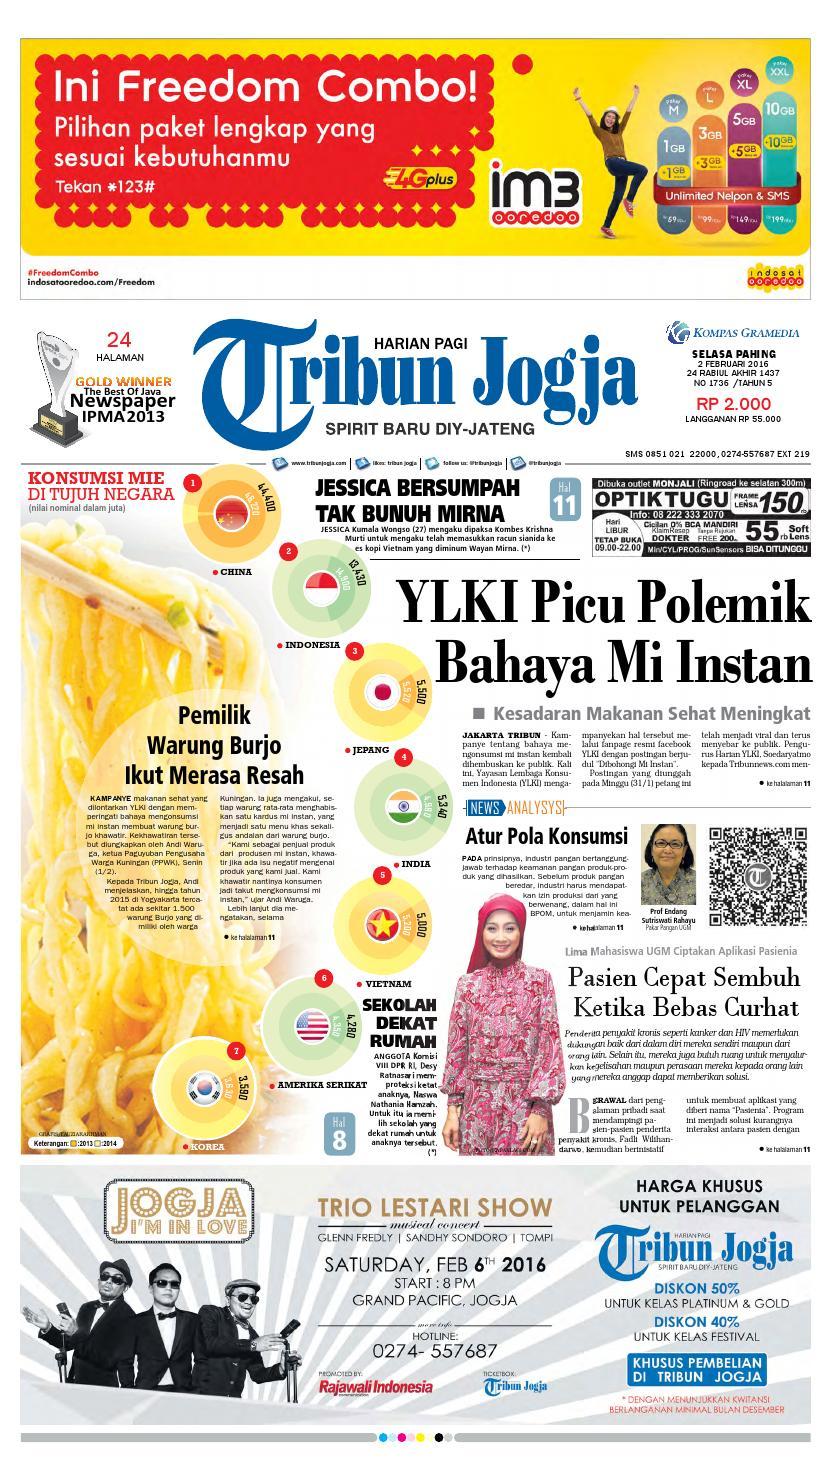 Tribunjogja 15 10 2014 By Tribun Jogja Issuu Produk Ukm Bumn Ci Embul Tahu Bakso 250g Original Free Ongkir Depok Ampamp Jakarta 02 2016